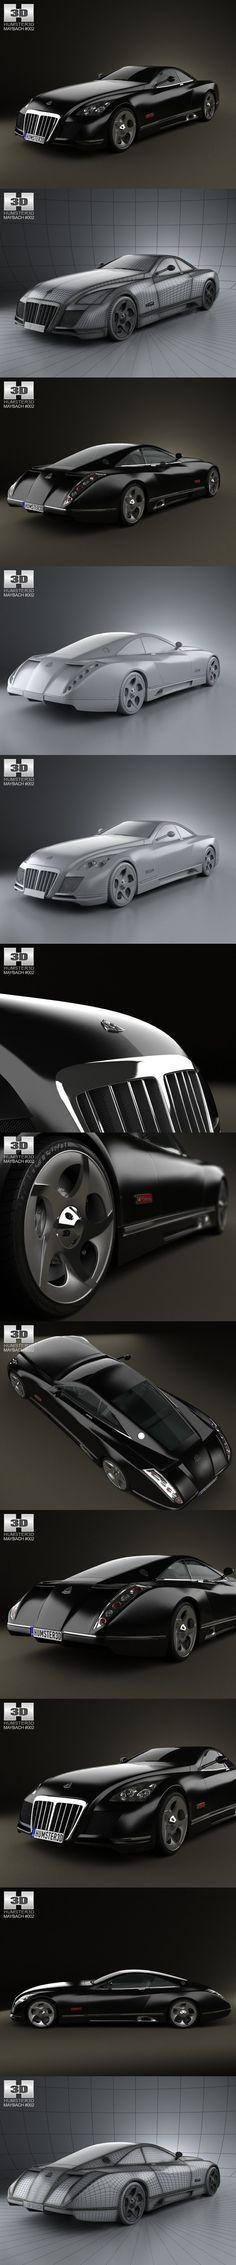 Maybach Exelero 2005. 3D Vehicles